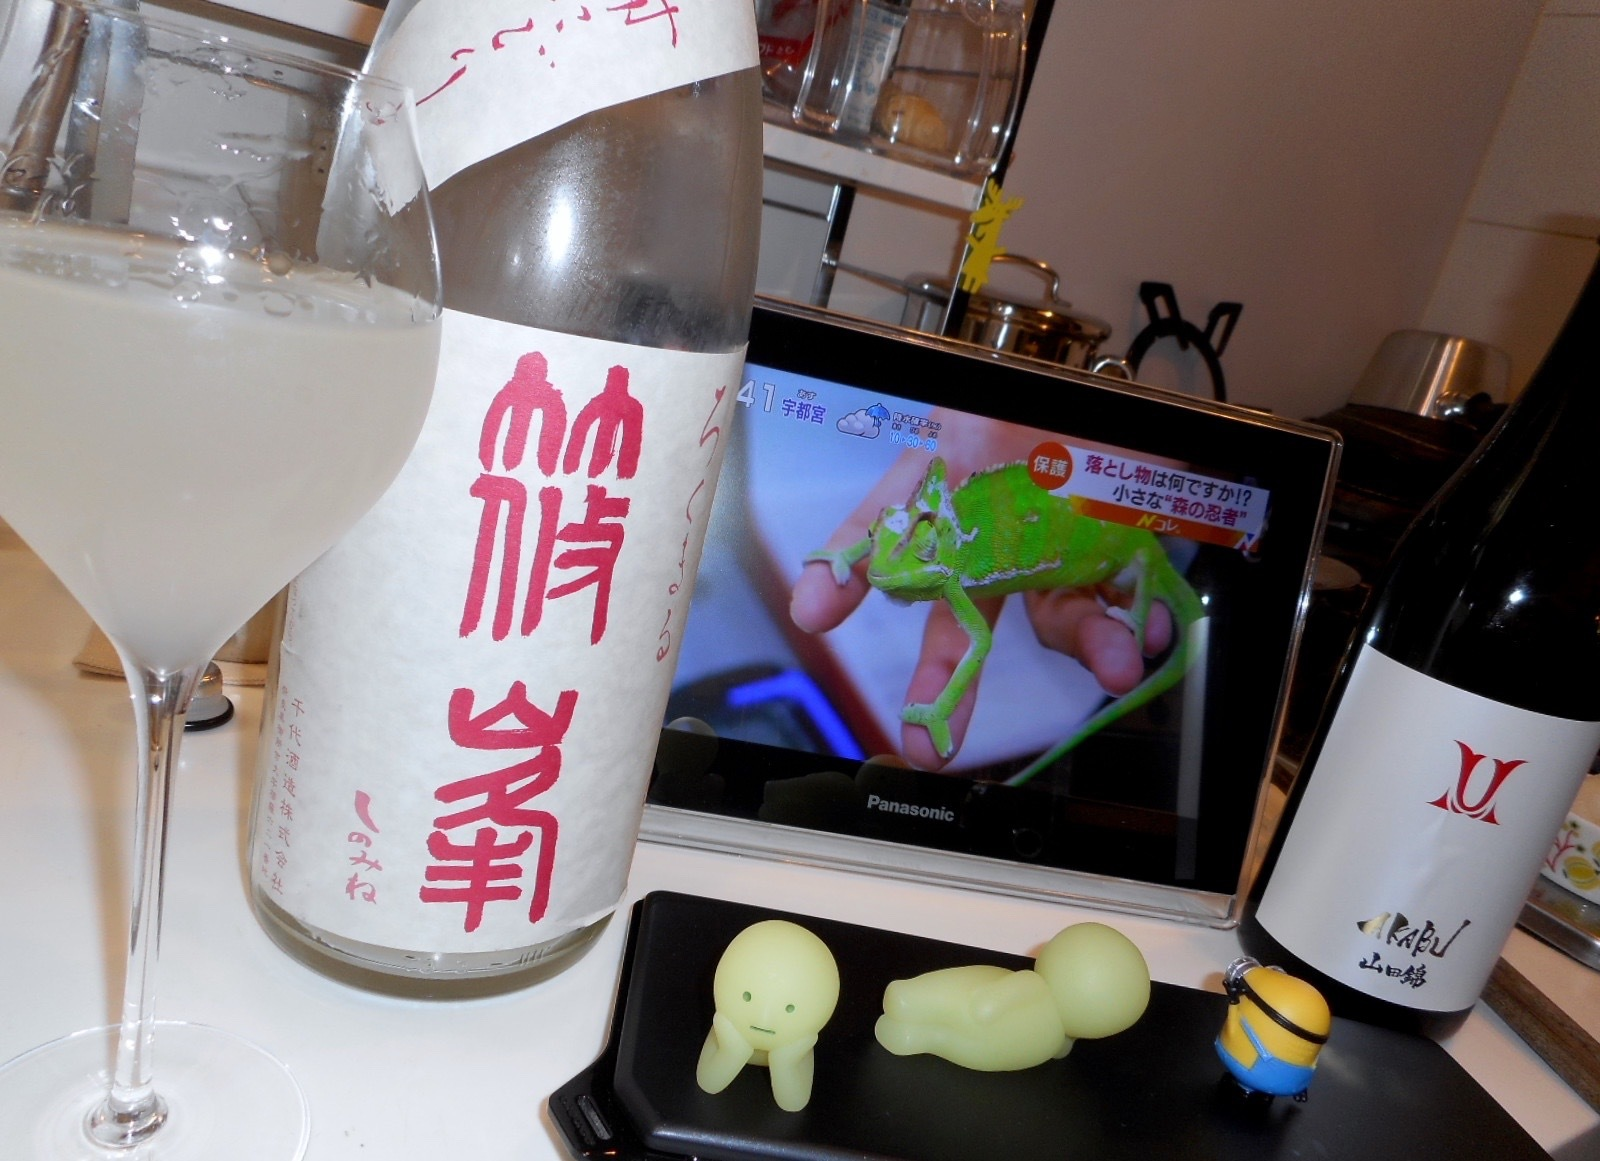 rokumaru_oyama_usunigori26by25.jpg